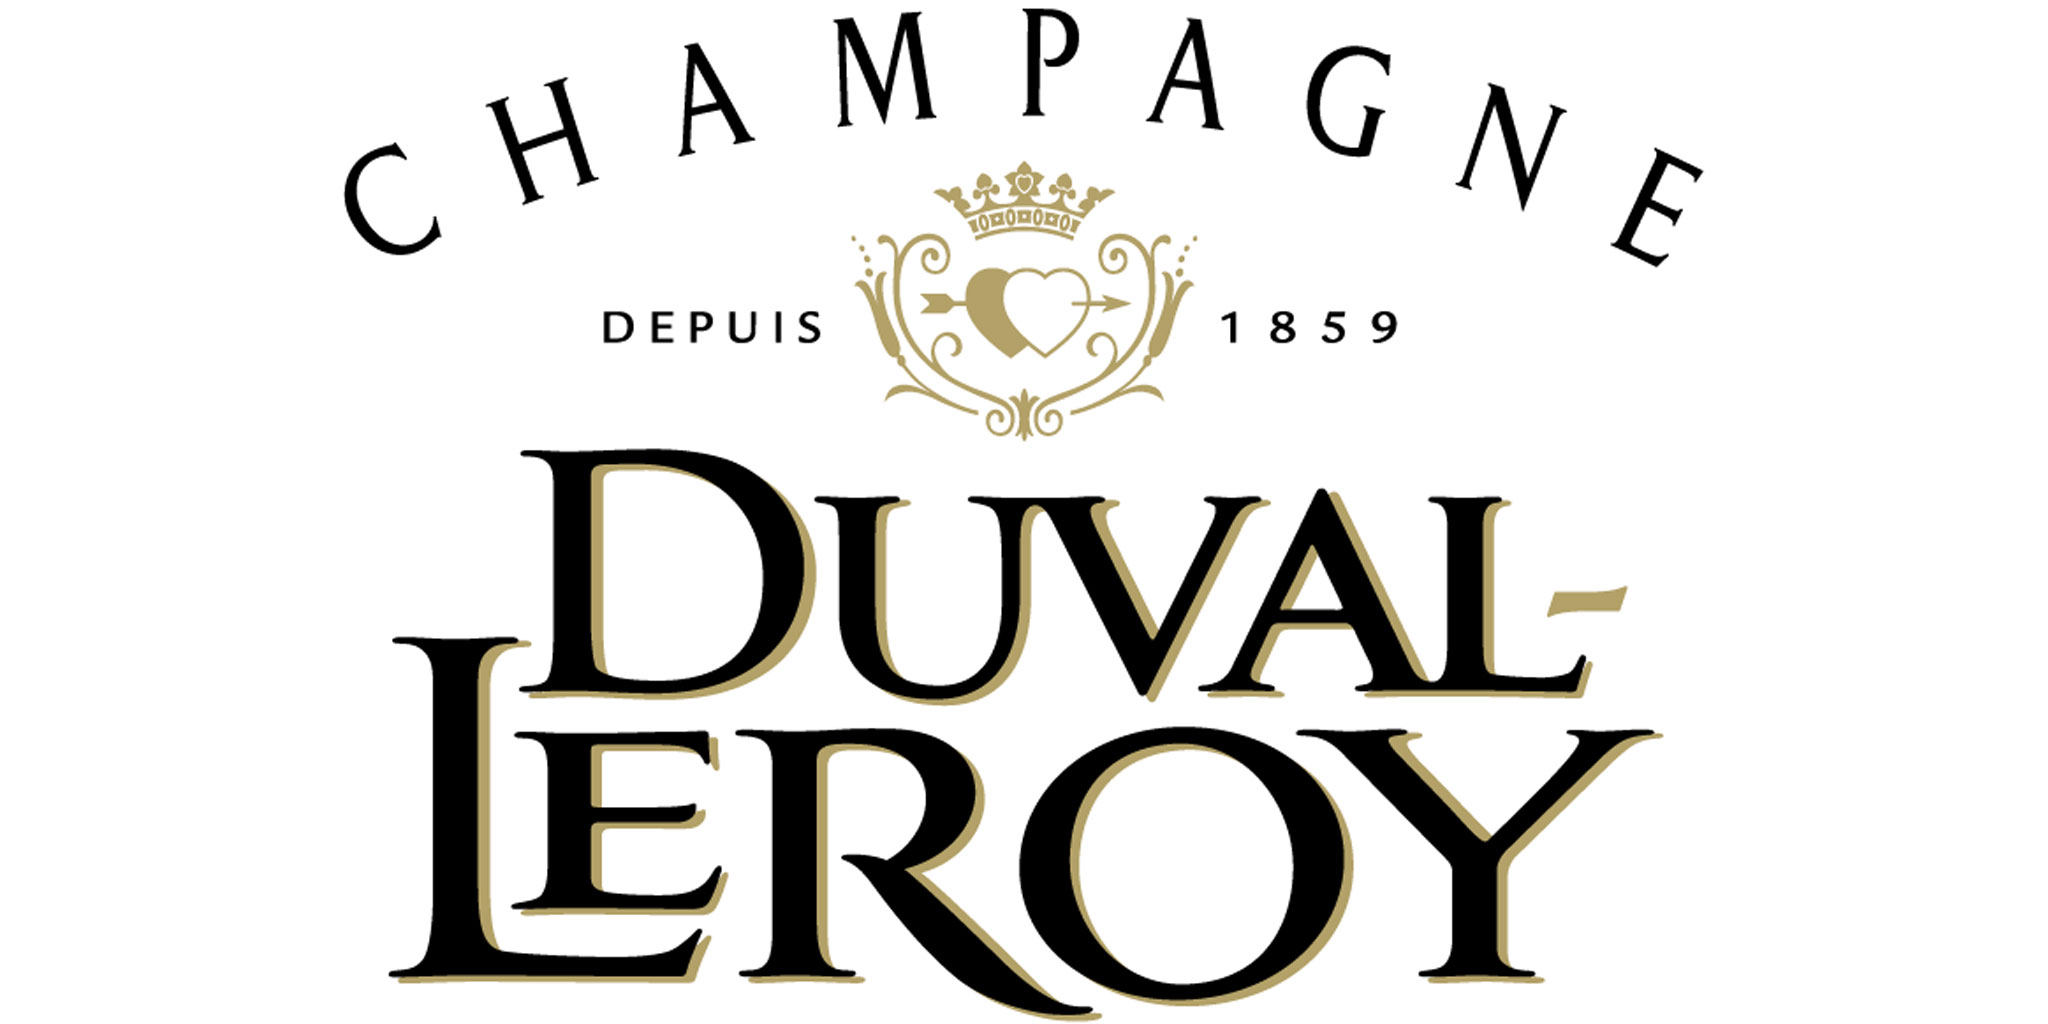 Duval-Leroy logo